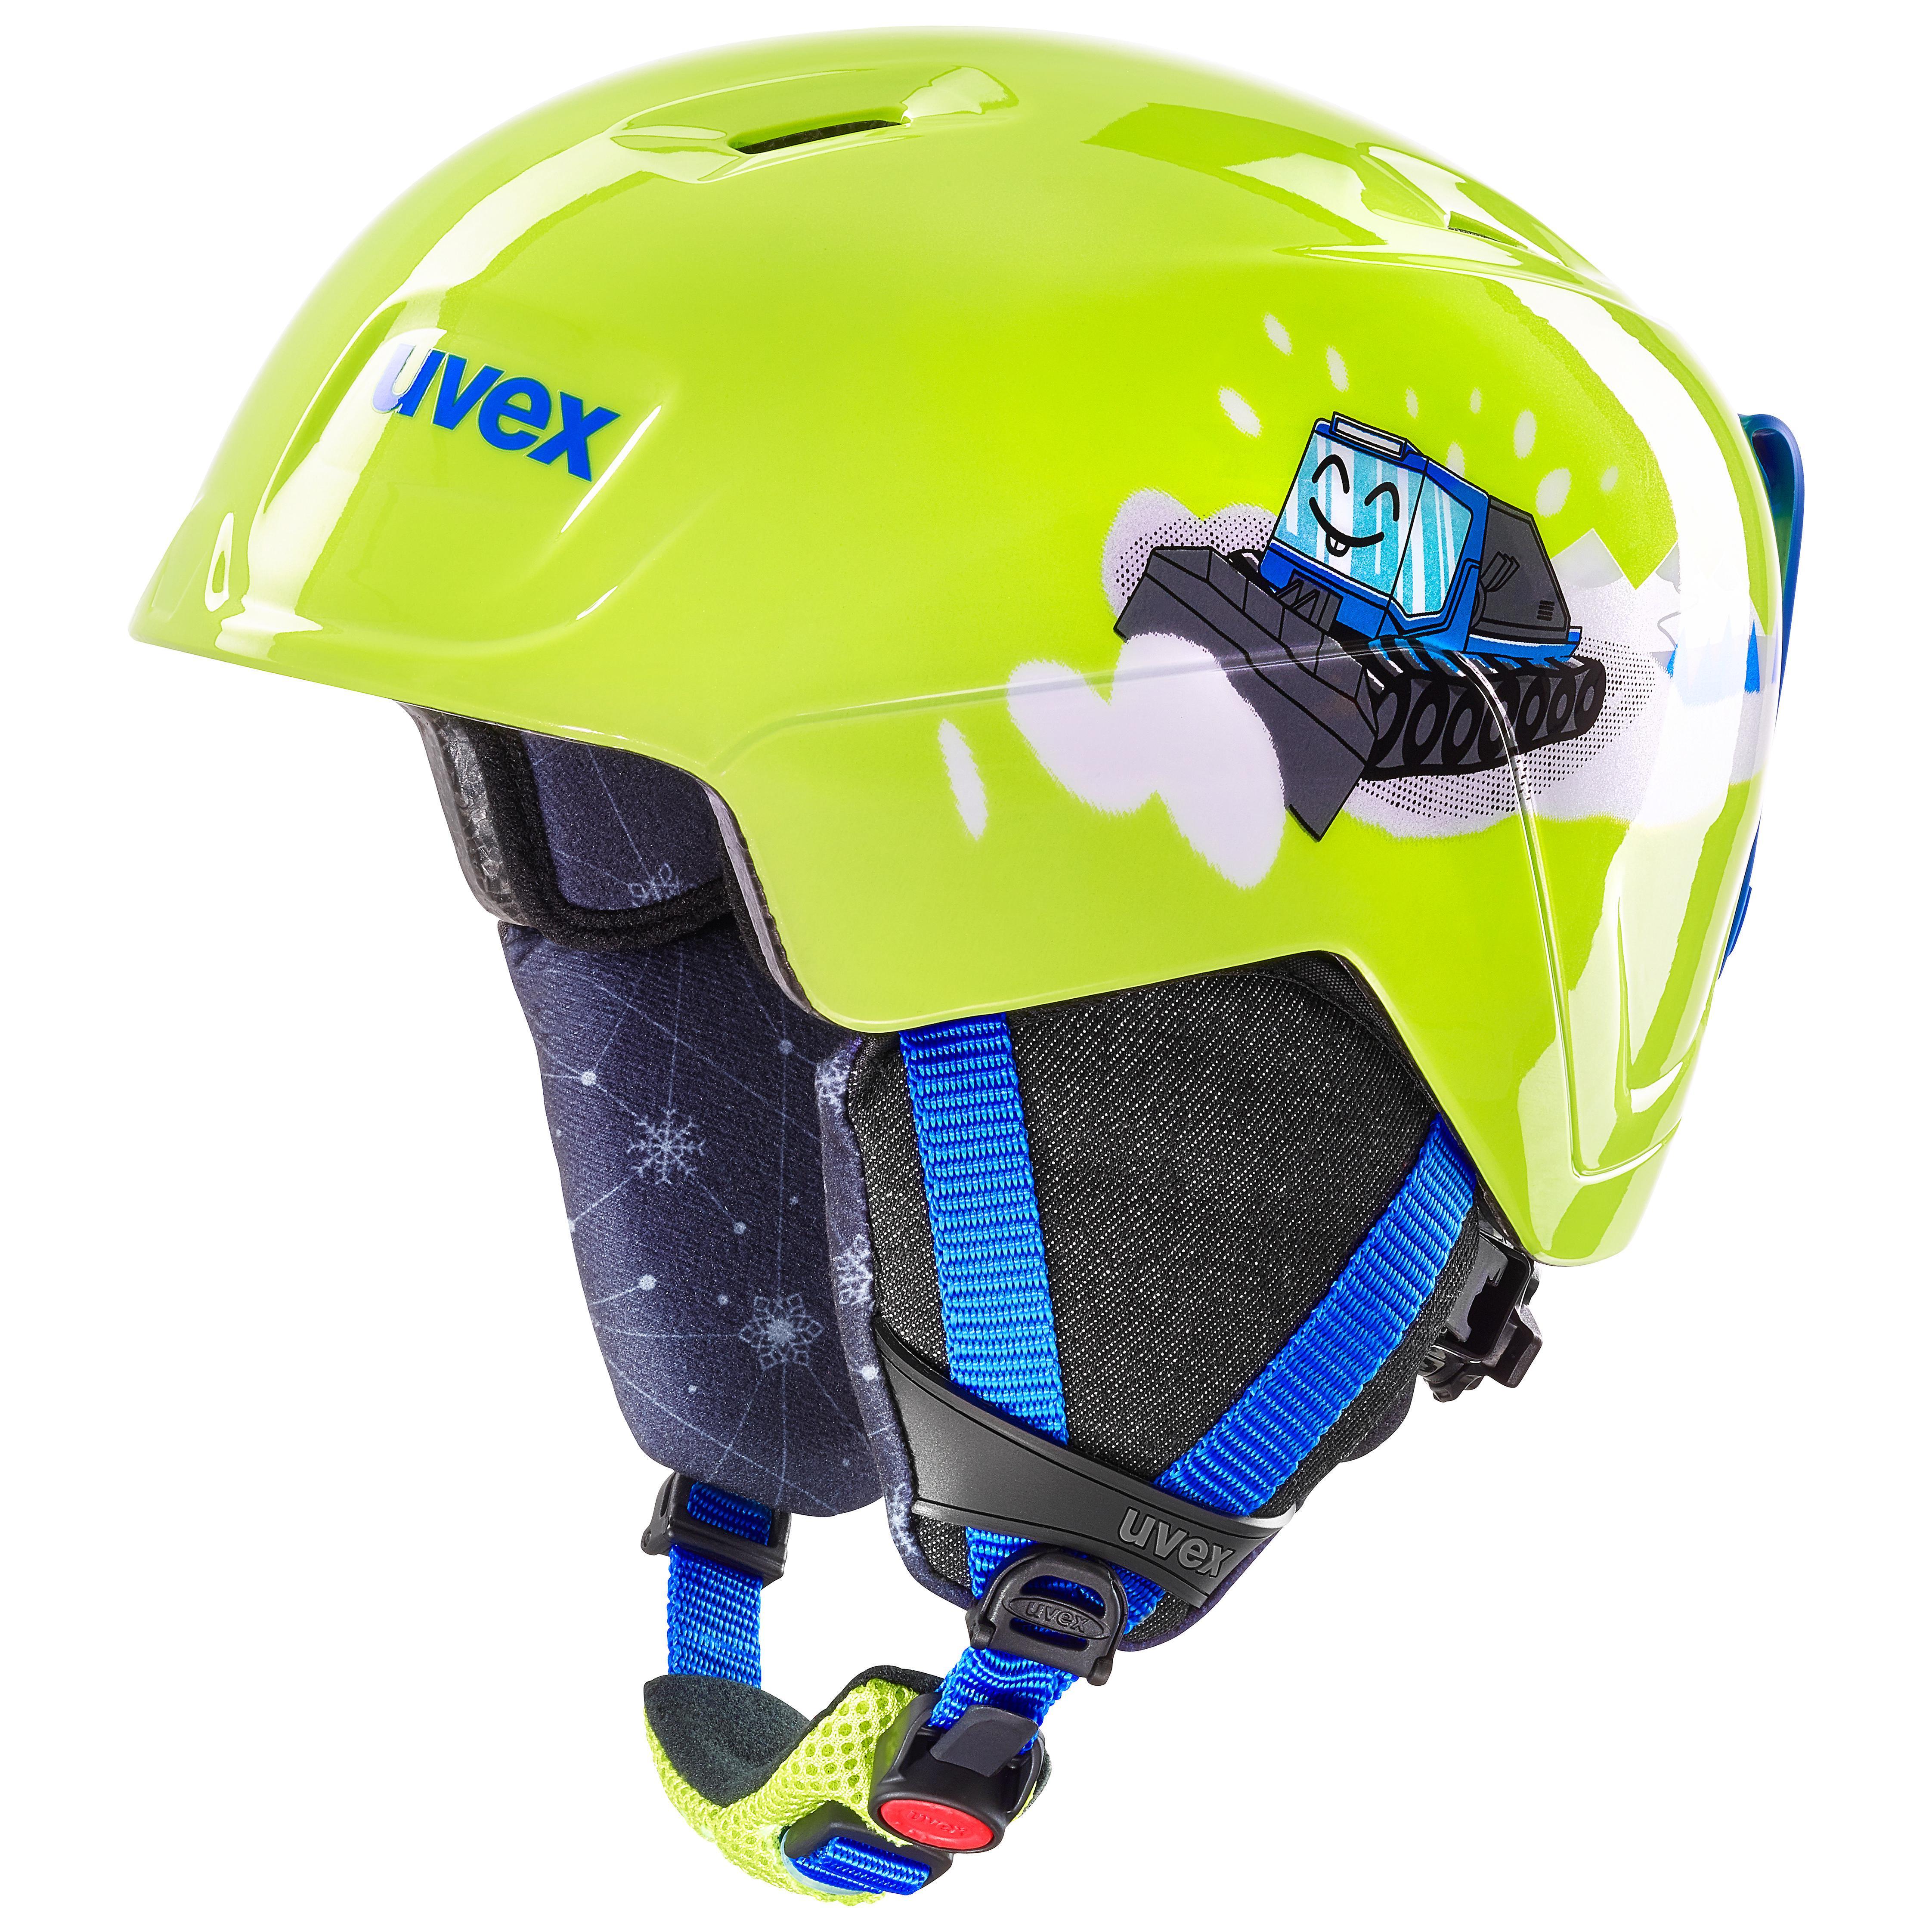 helma UVEX MANIC, lime caterpillar (S566226610*) 51-55